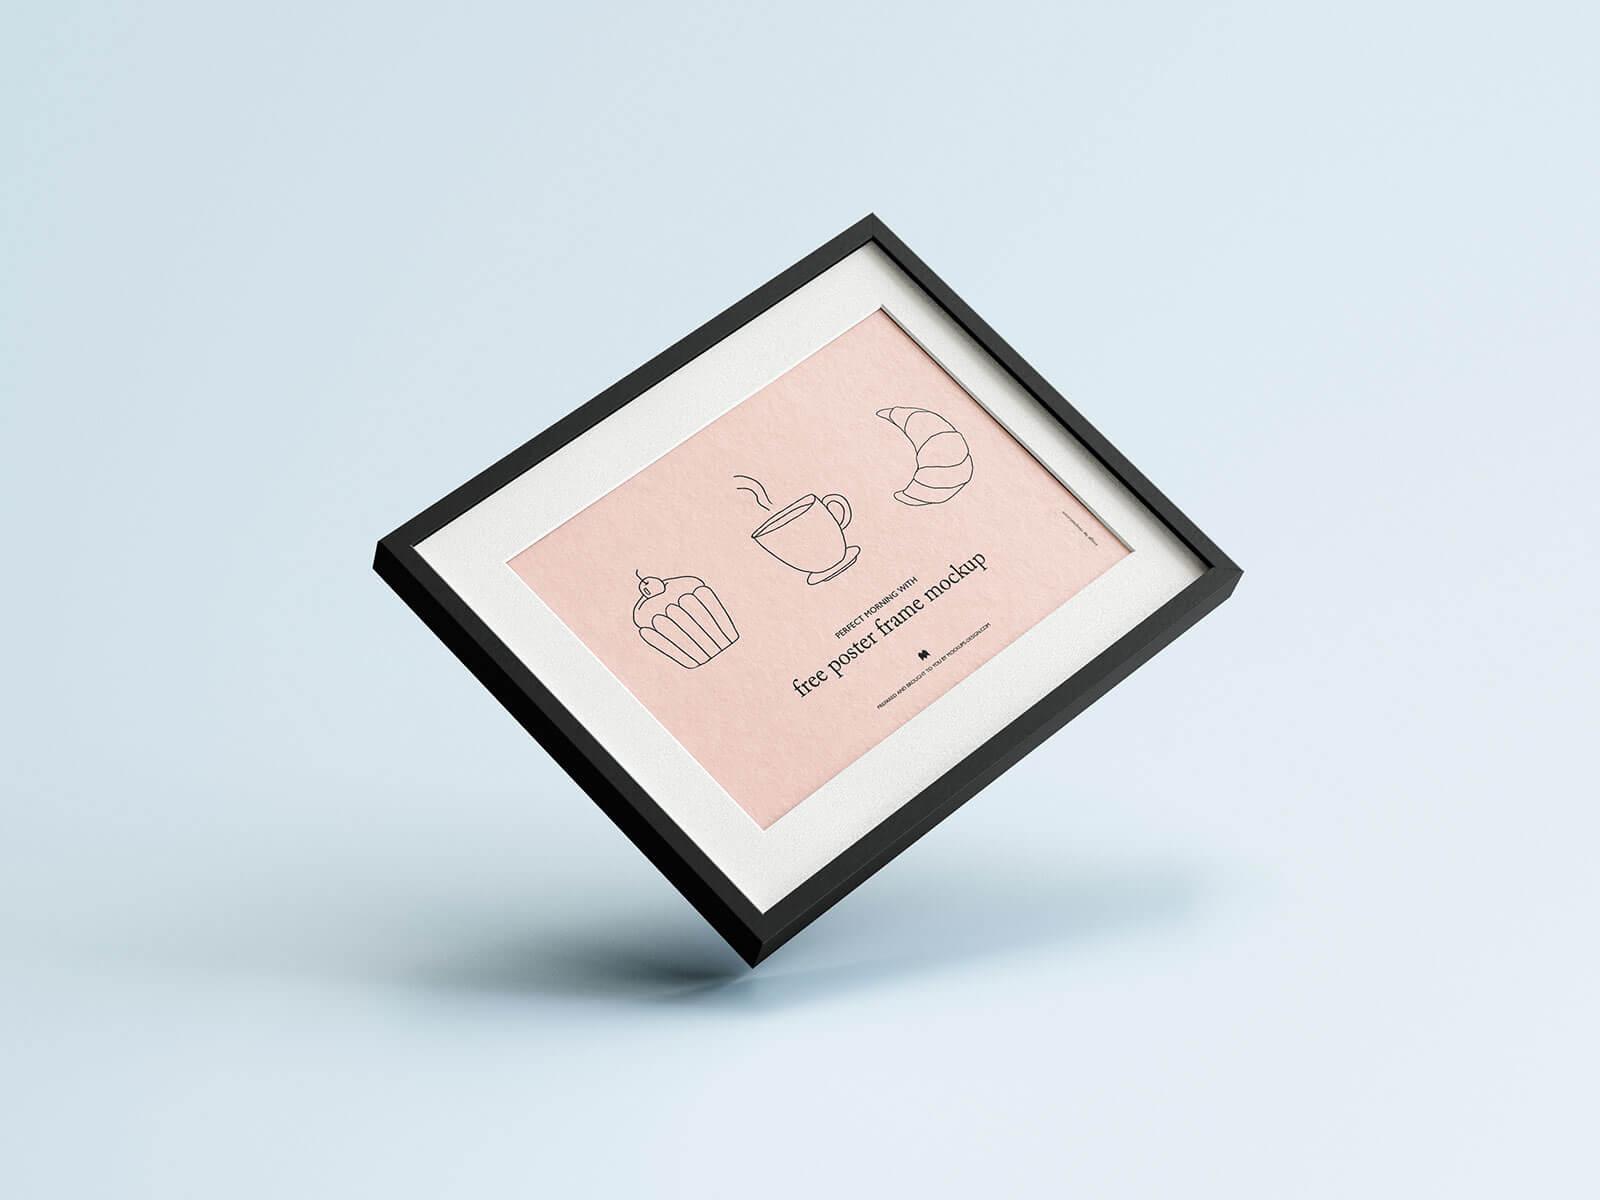 Free Horizontal Poster Frame Mockup PSD Set (1)